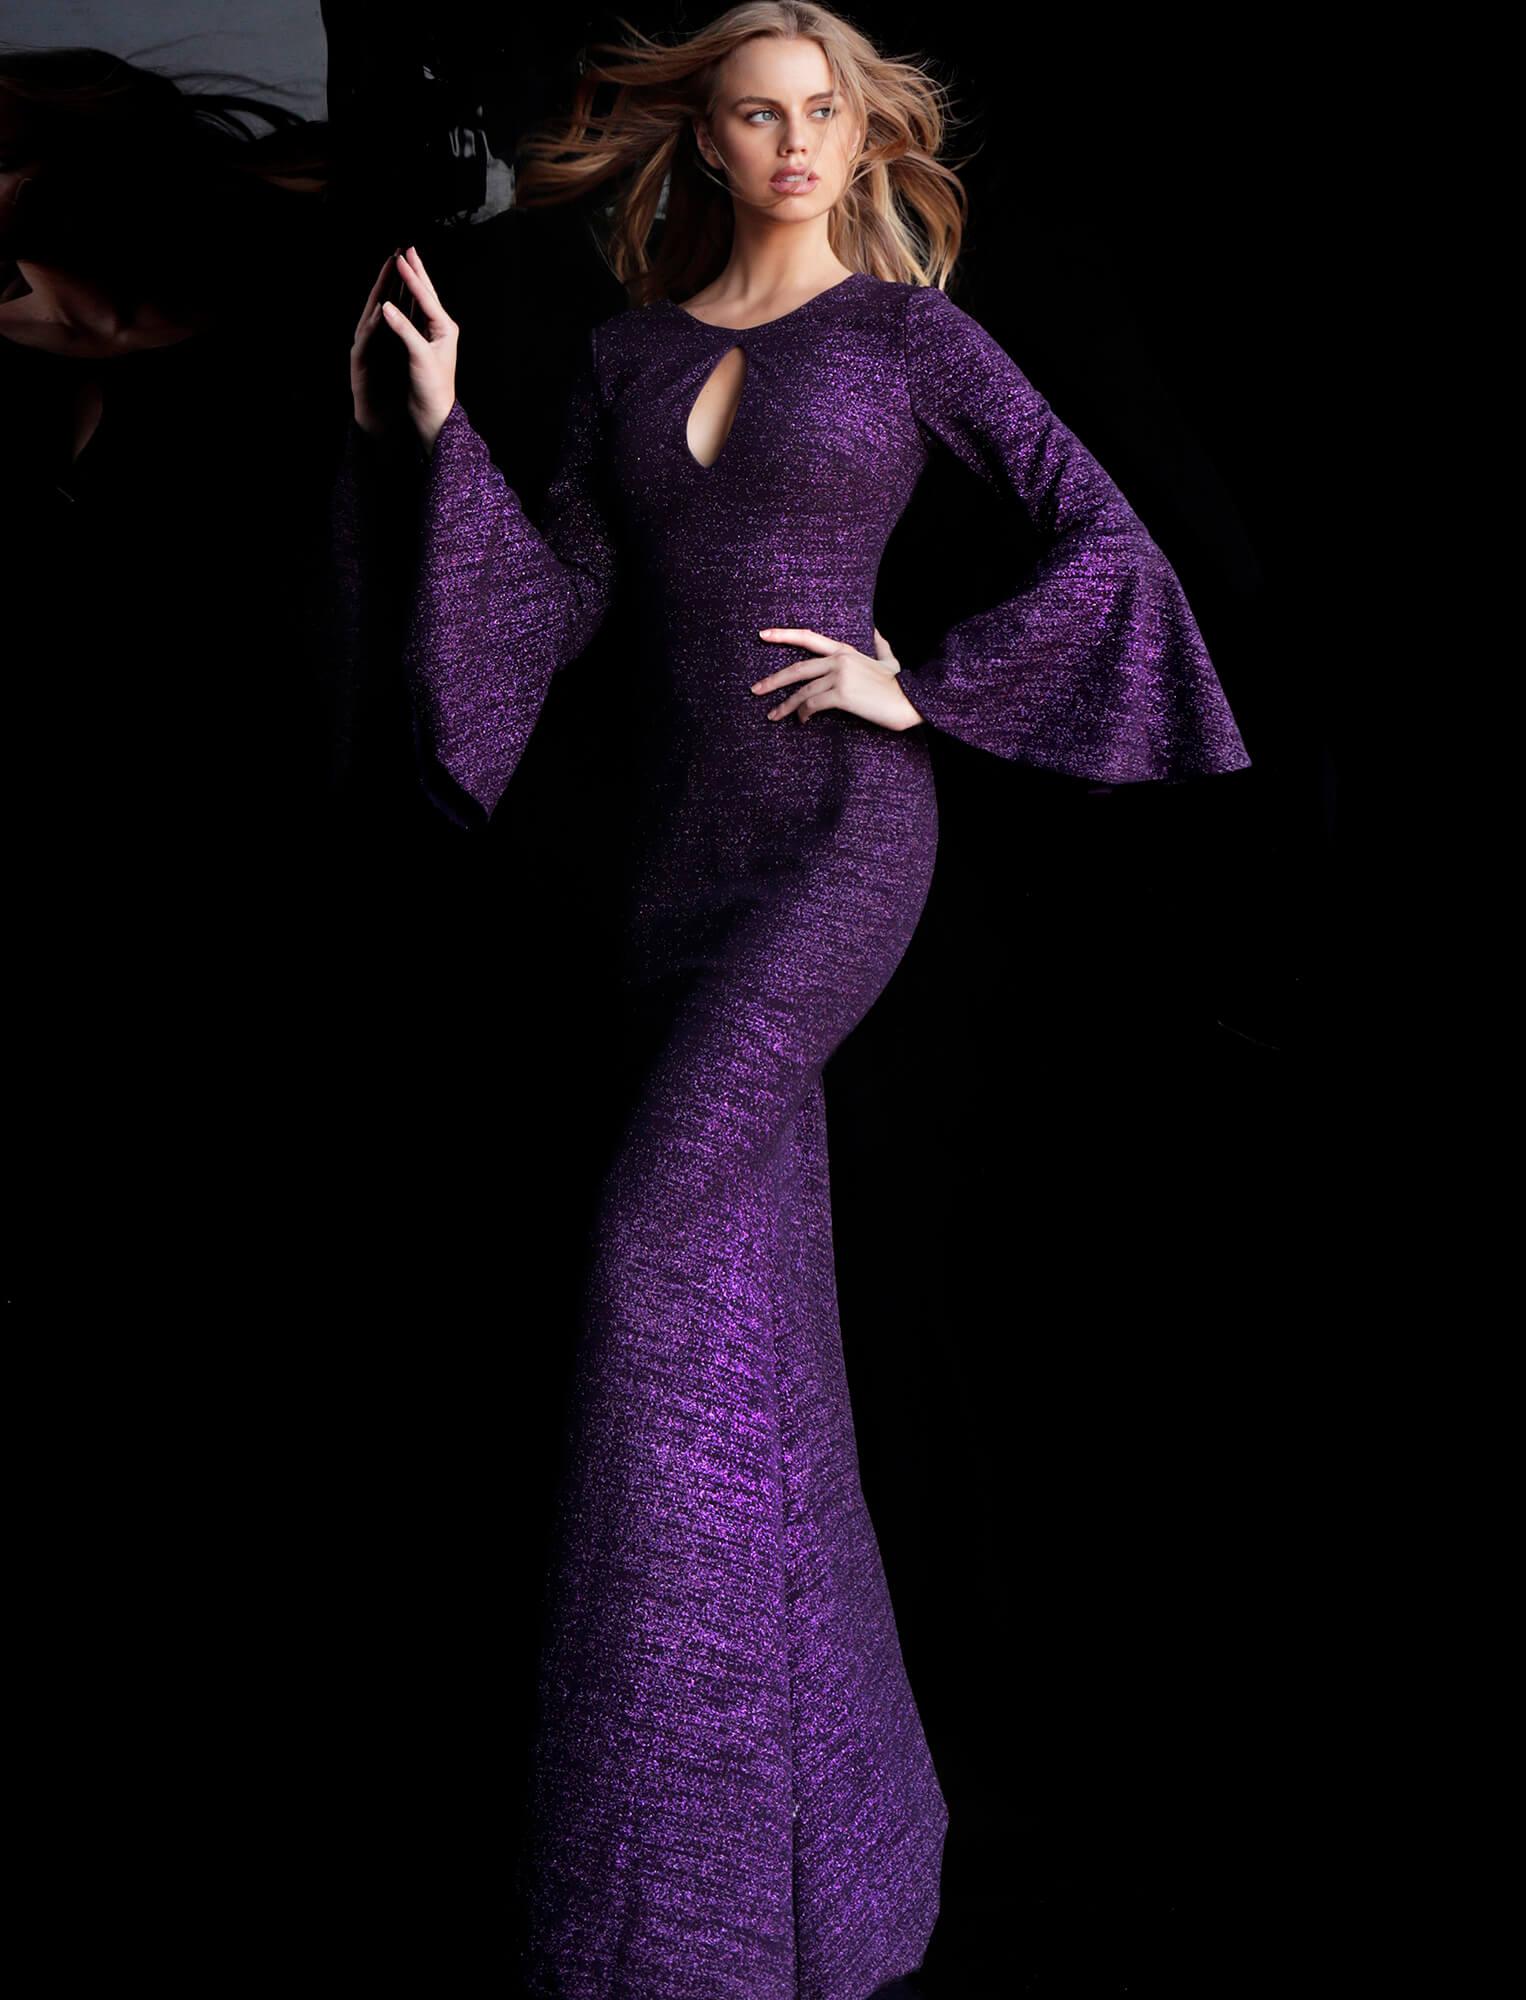 61104-Purple -2.jpg